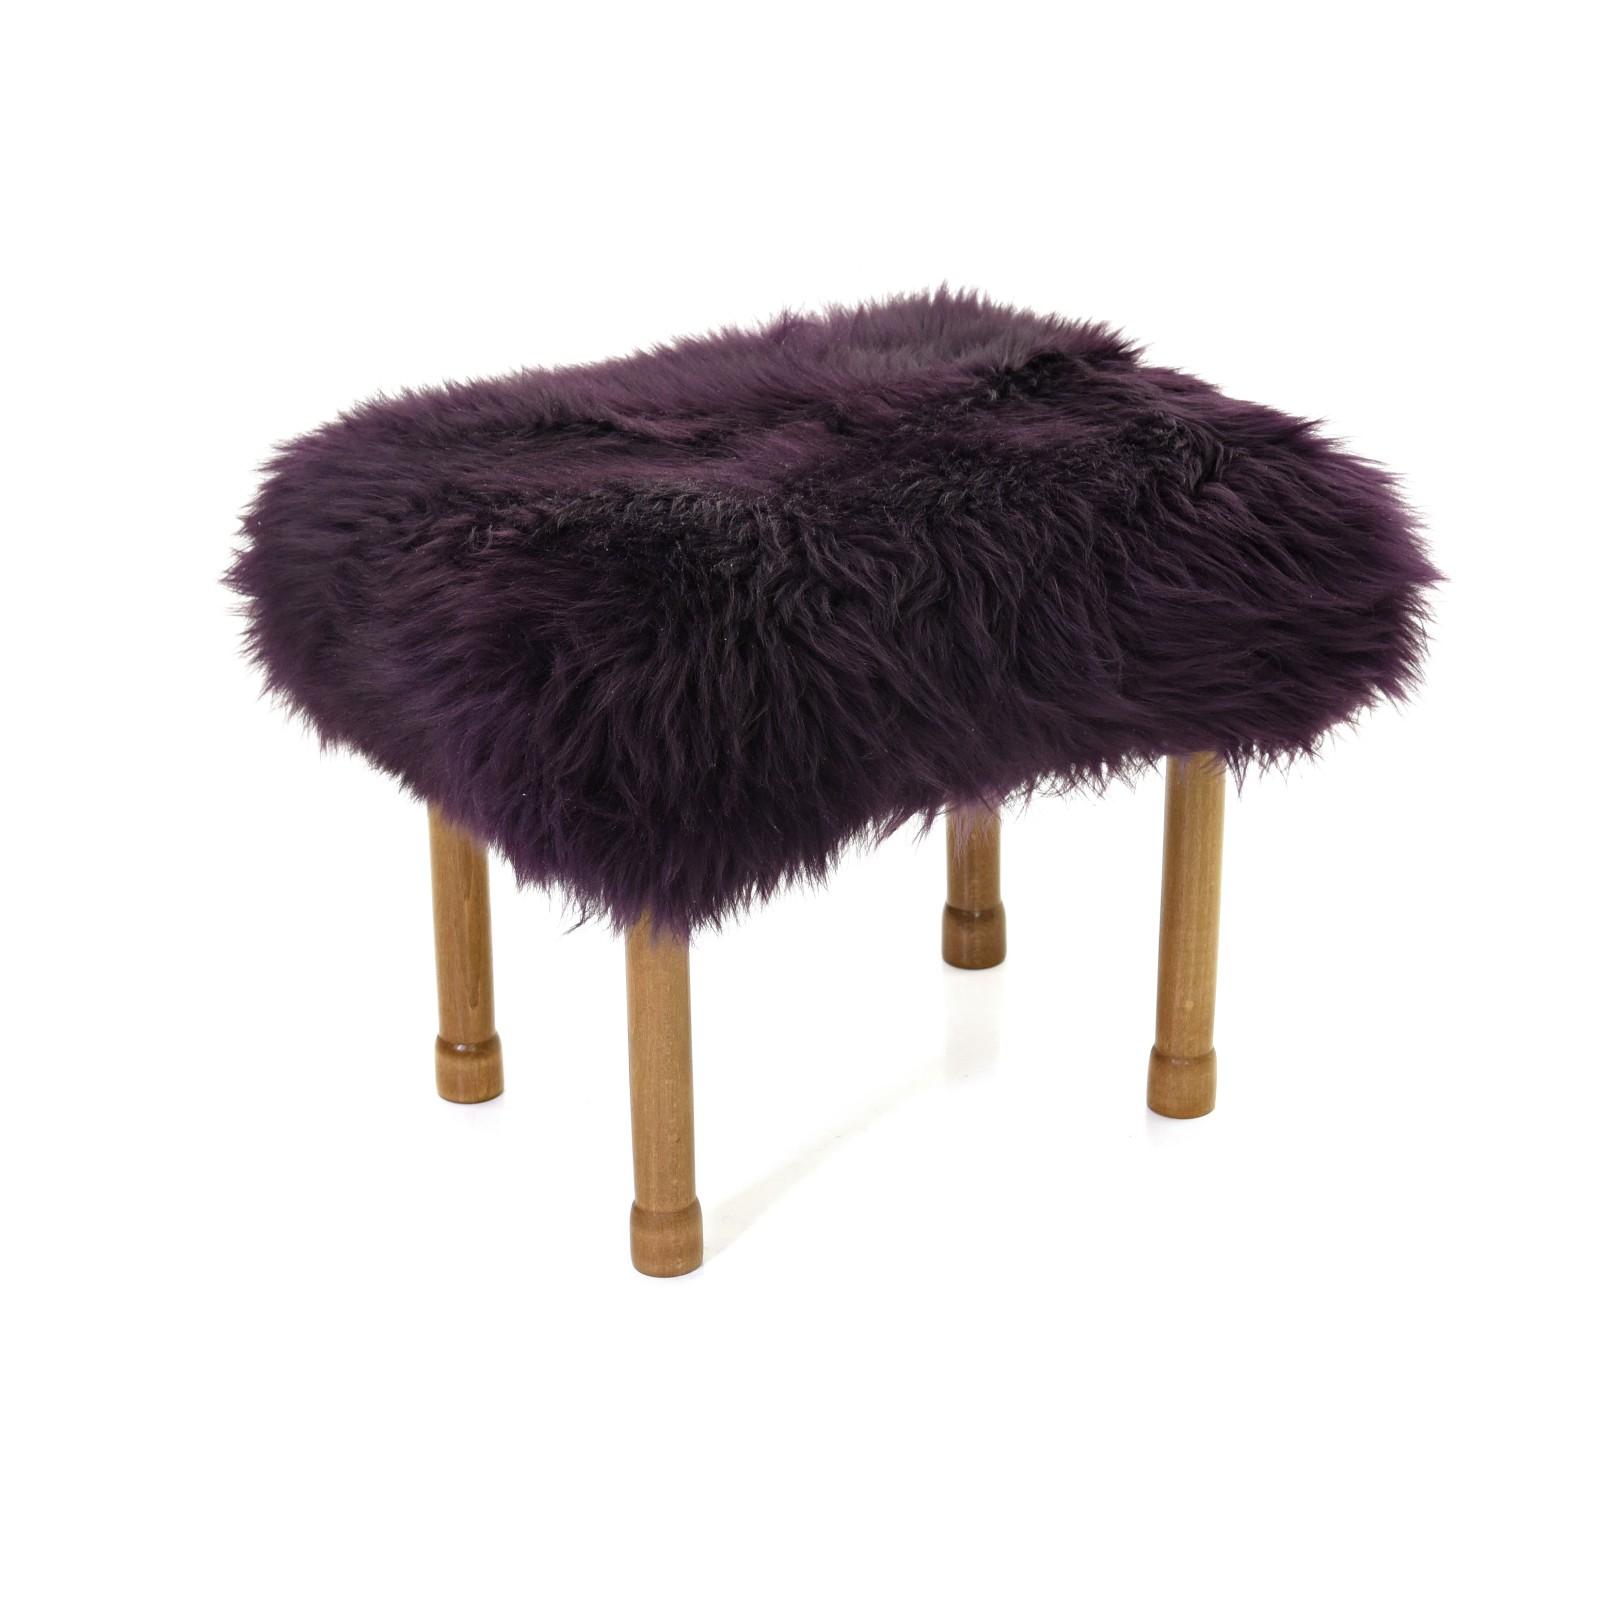 Myfanwy Sheepskin Footstool Aubergine